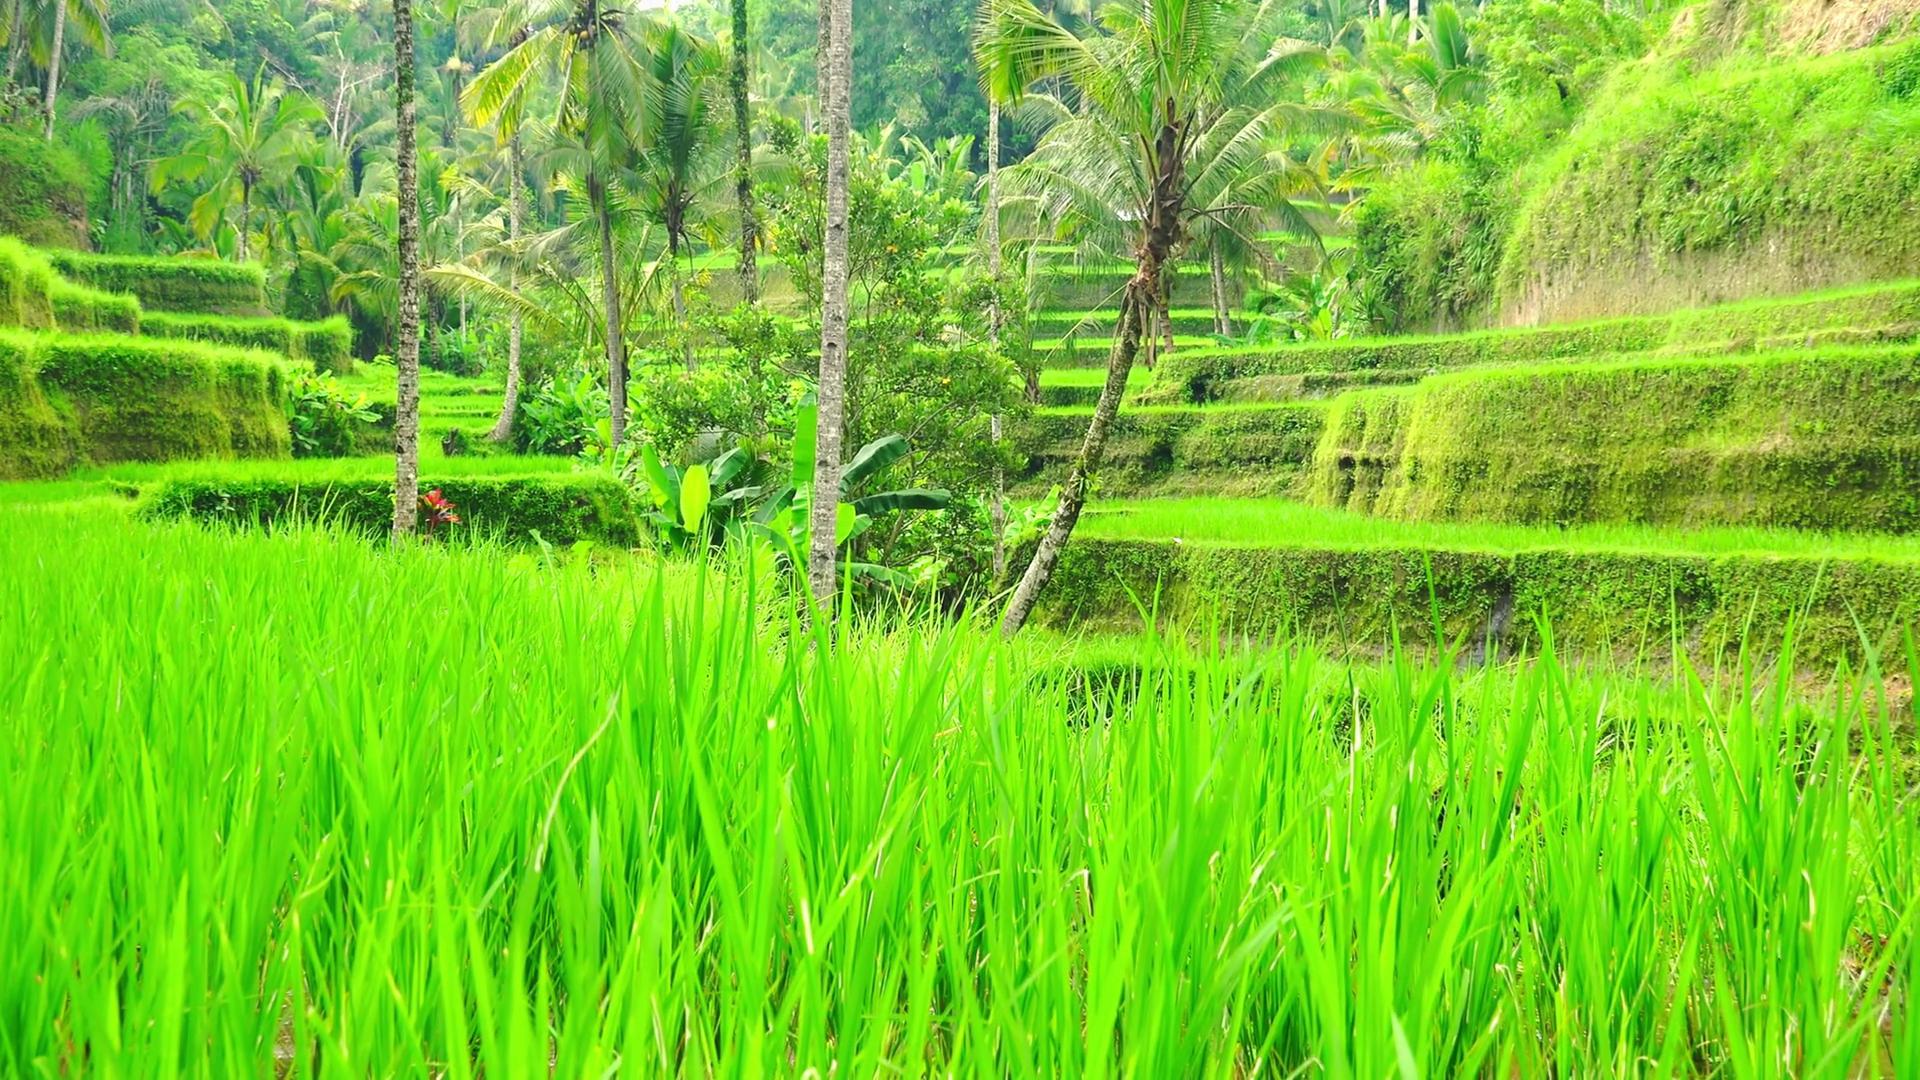 Lush green photo